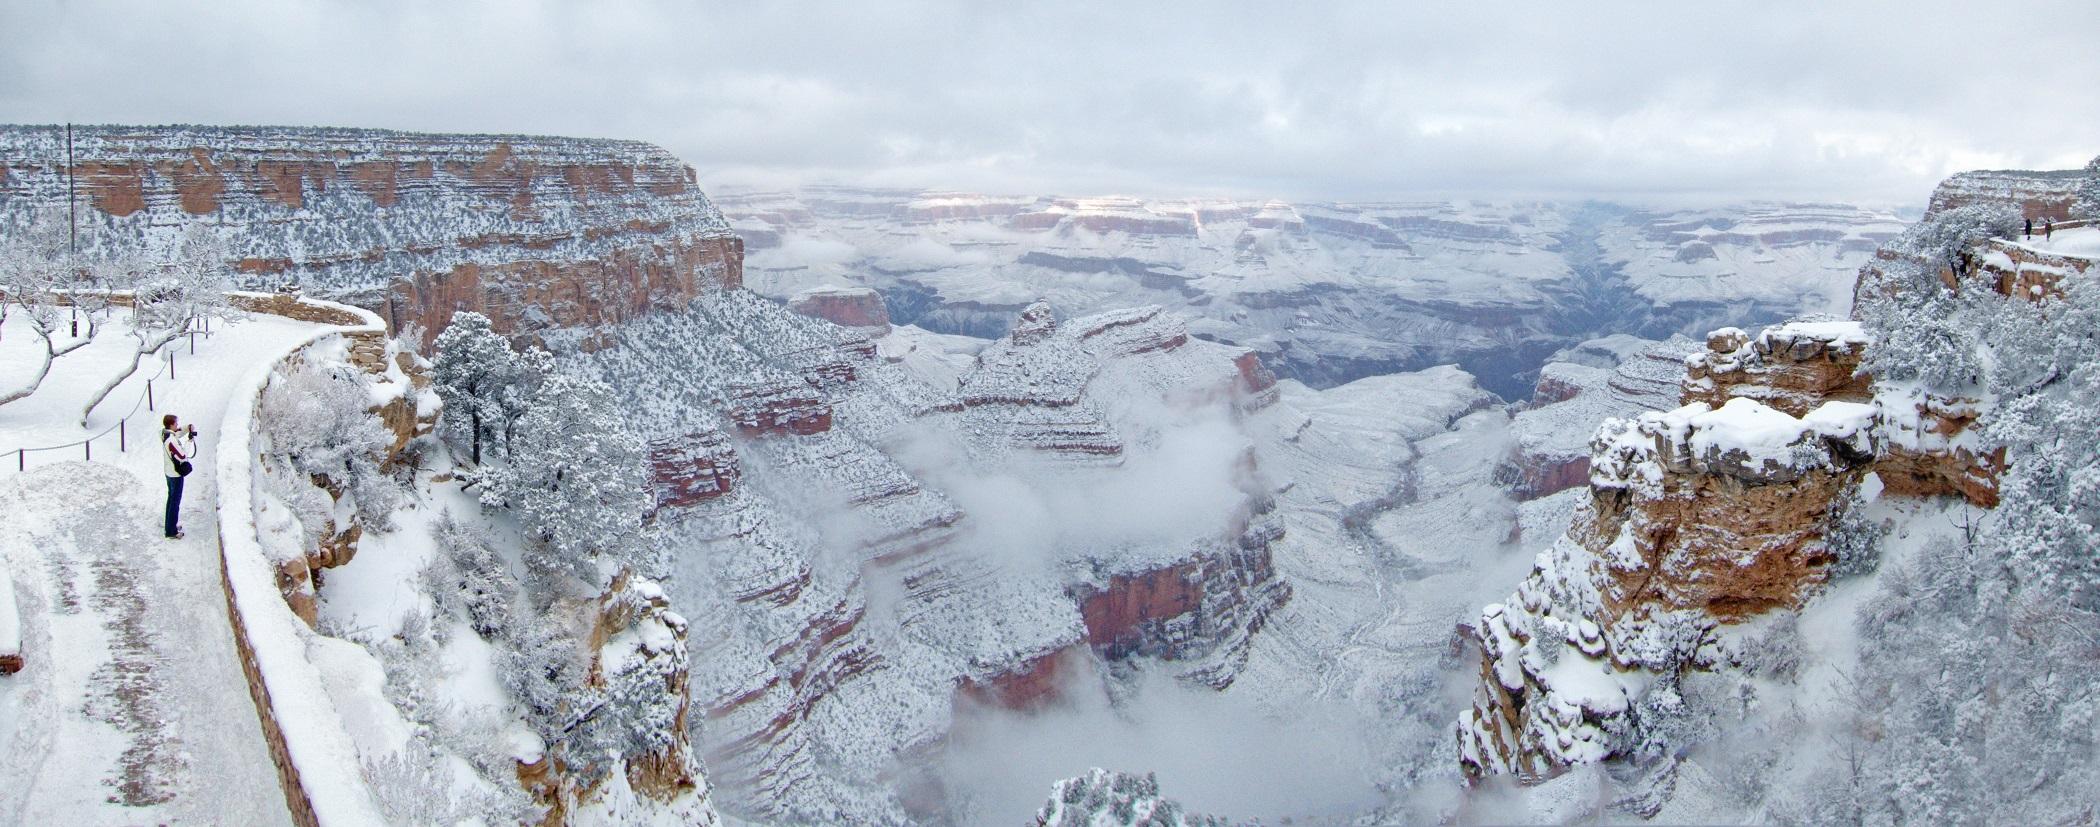 Grand Canyon, Canyon, Frozen, Grand, Ice, HQ Photo